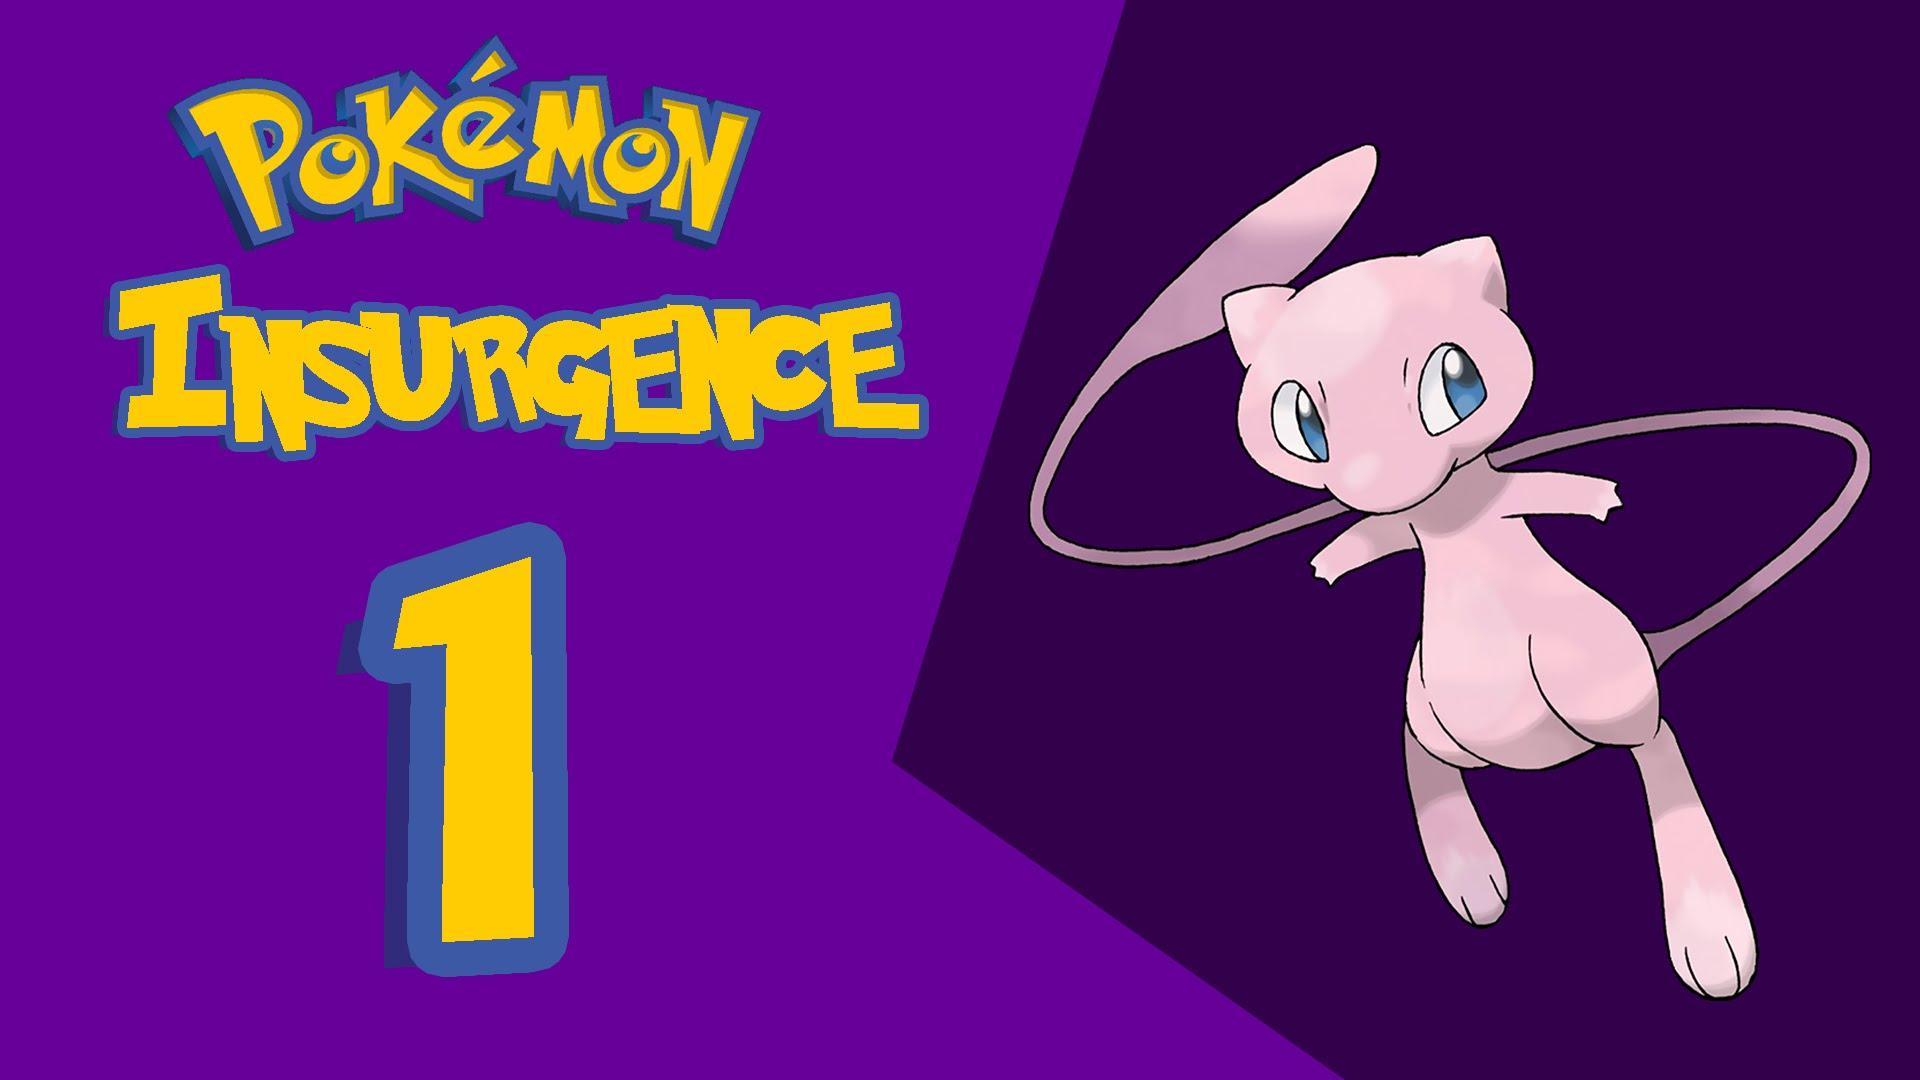 Pokemon Insurgence.